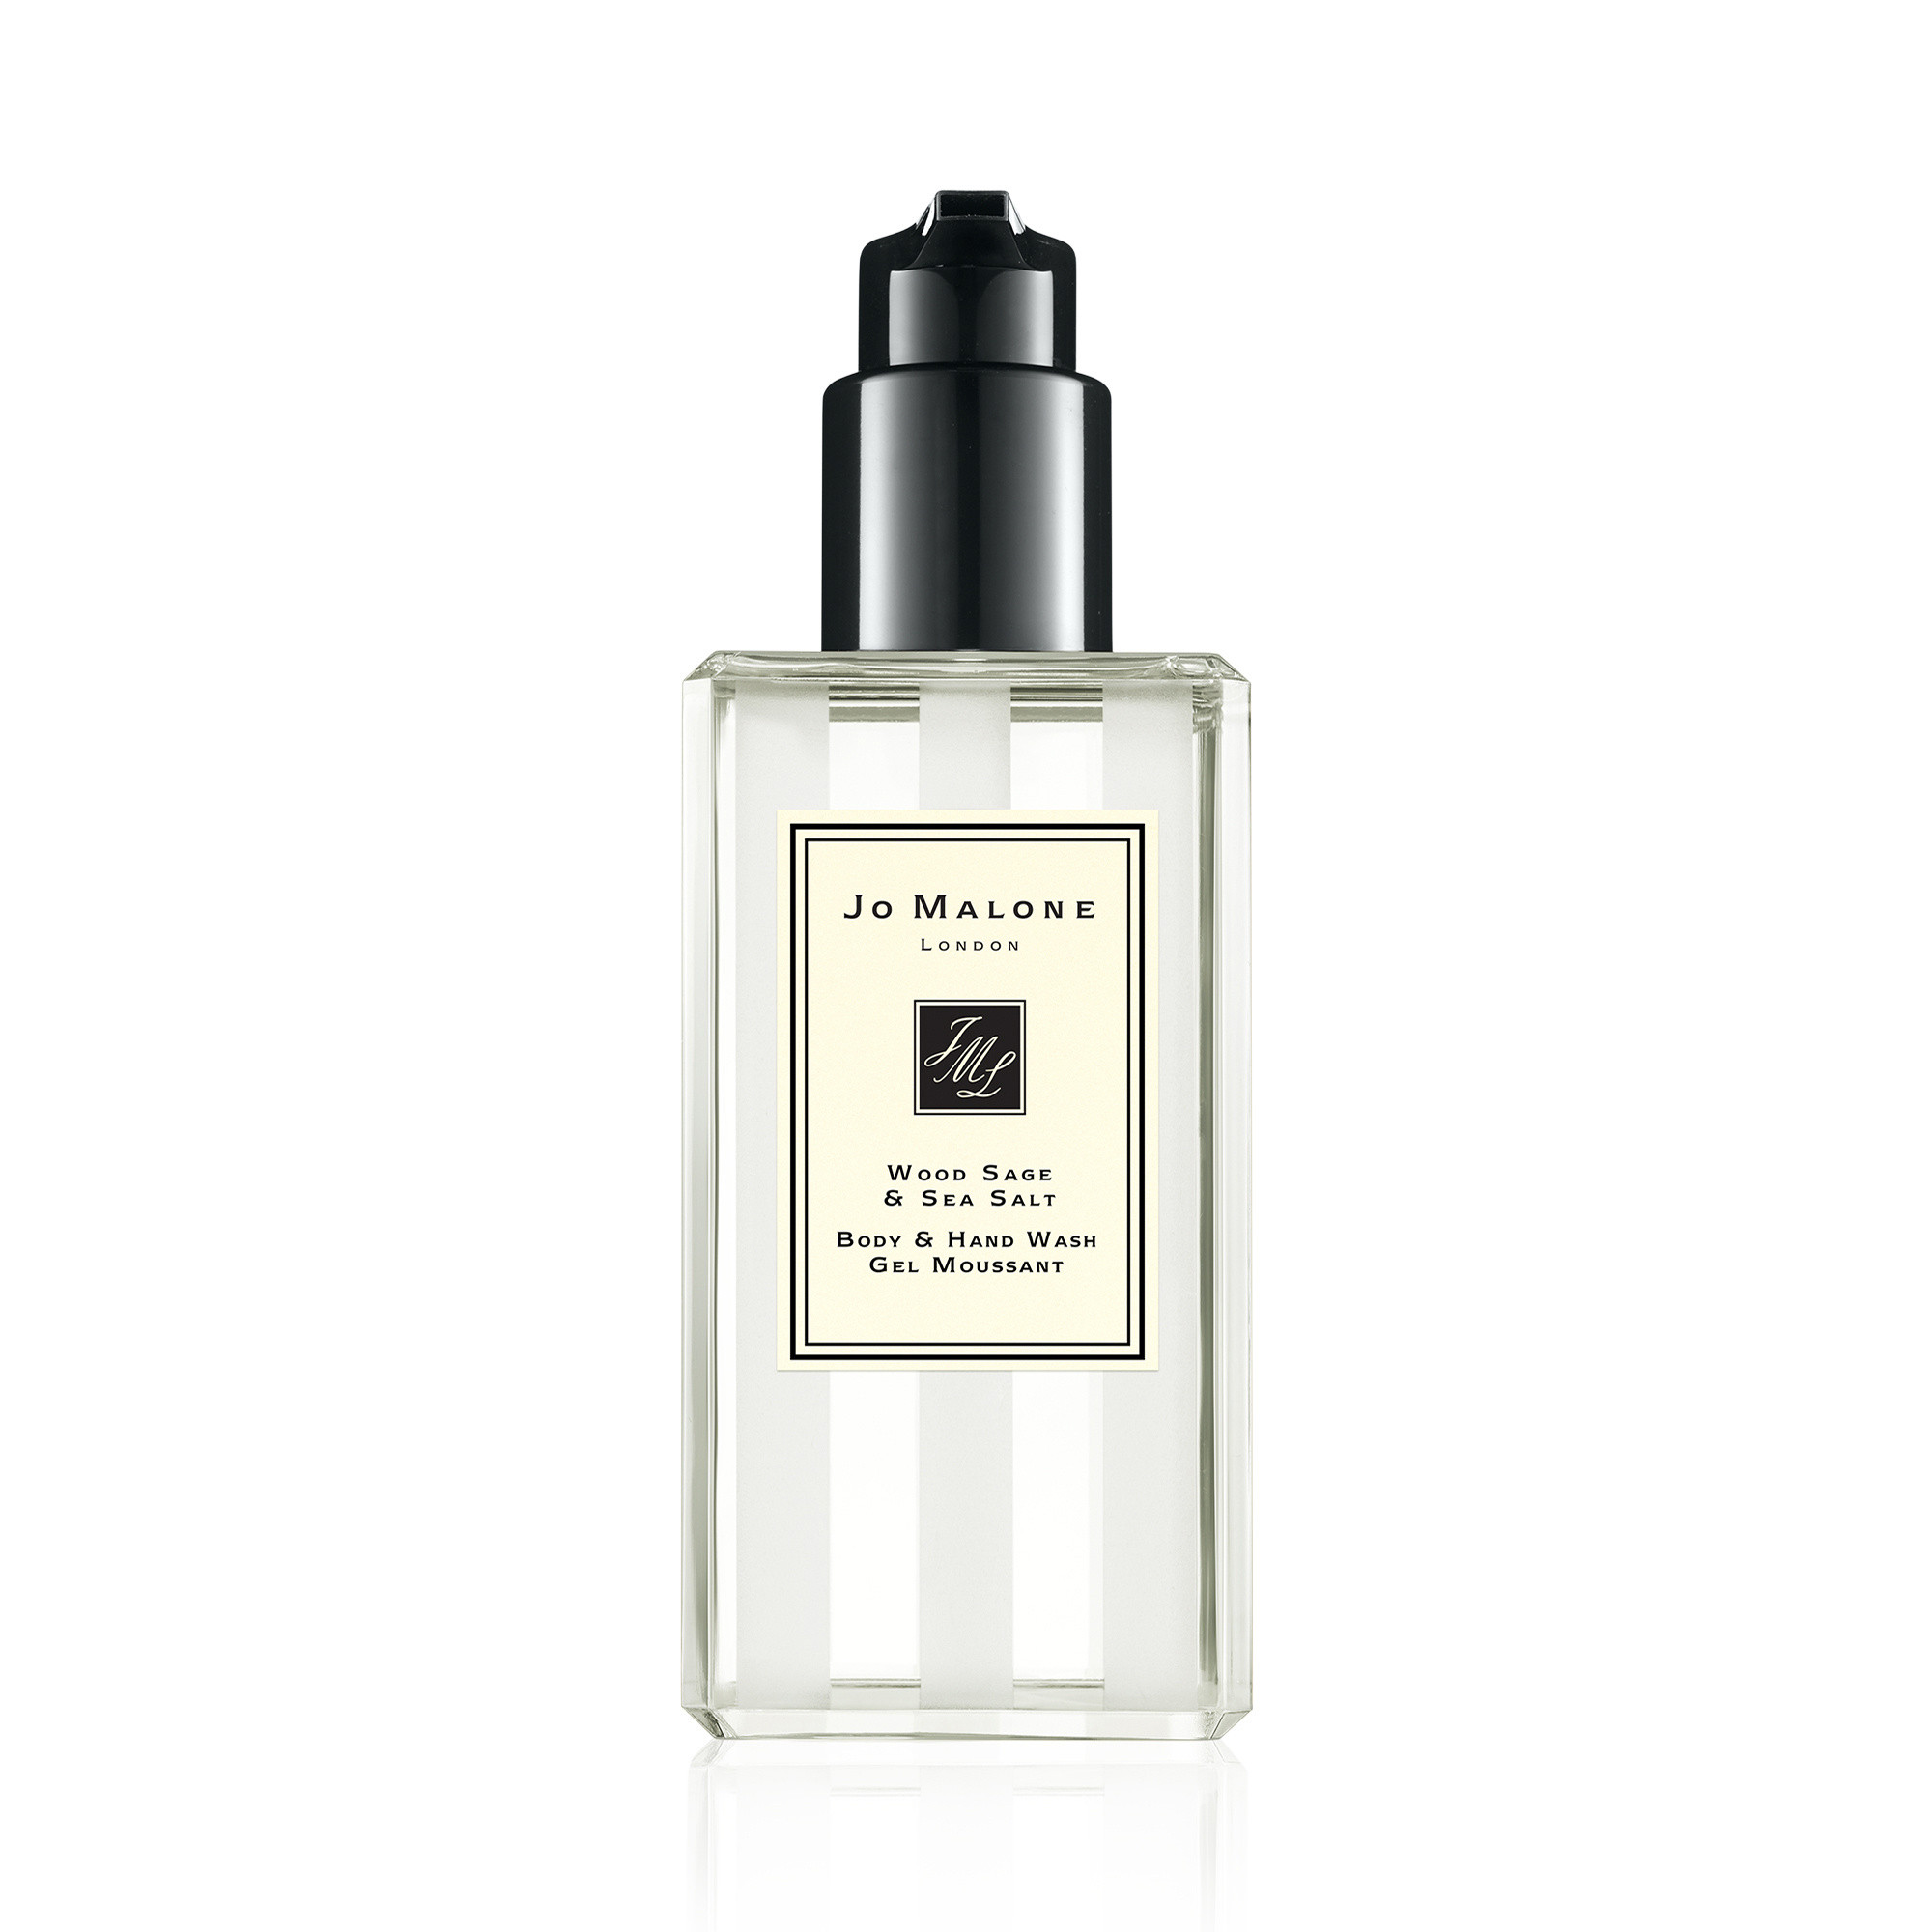 Jo Malone London wood sage & sea salt body & hand wash 250 ml, Beige, large image number 0